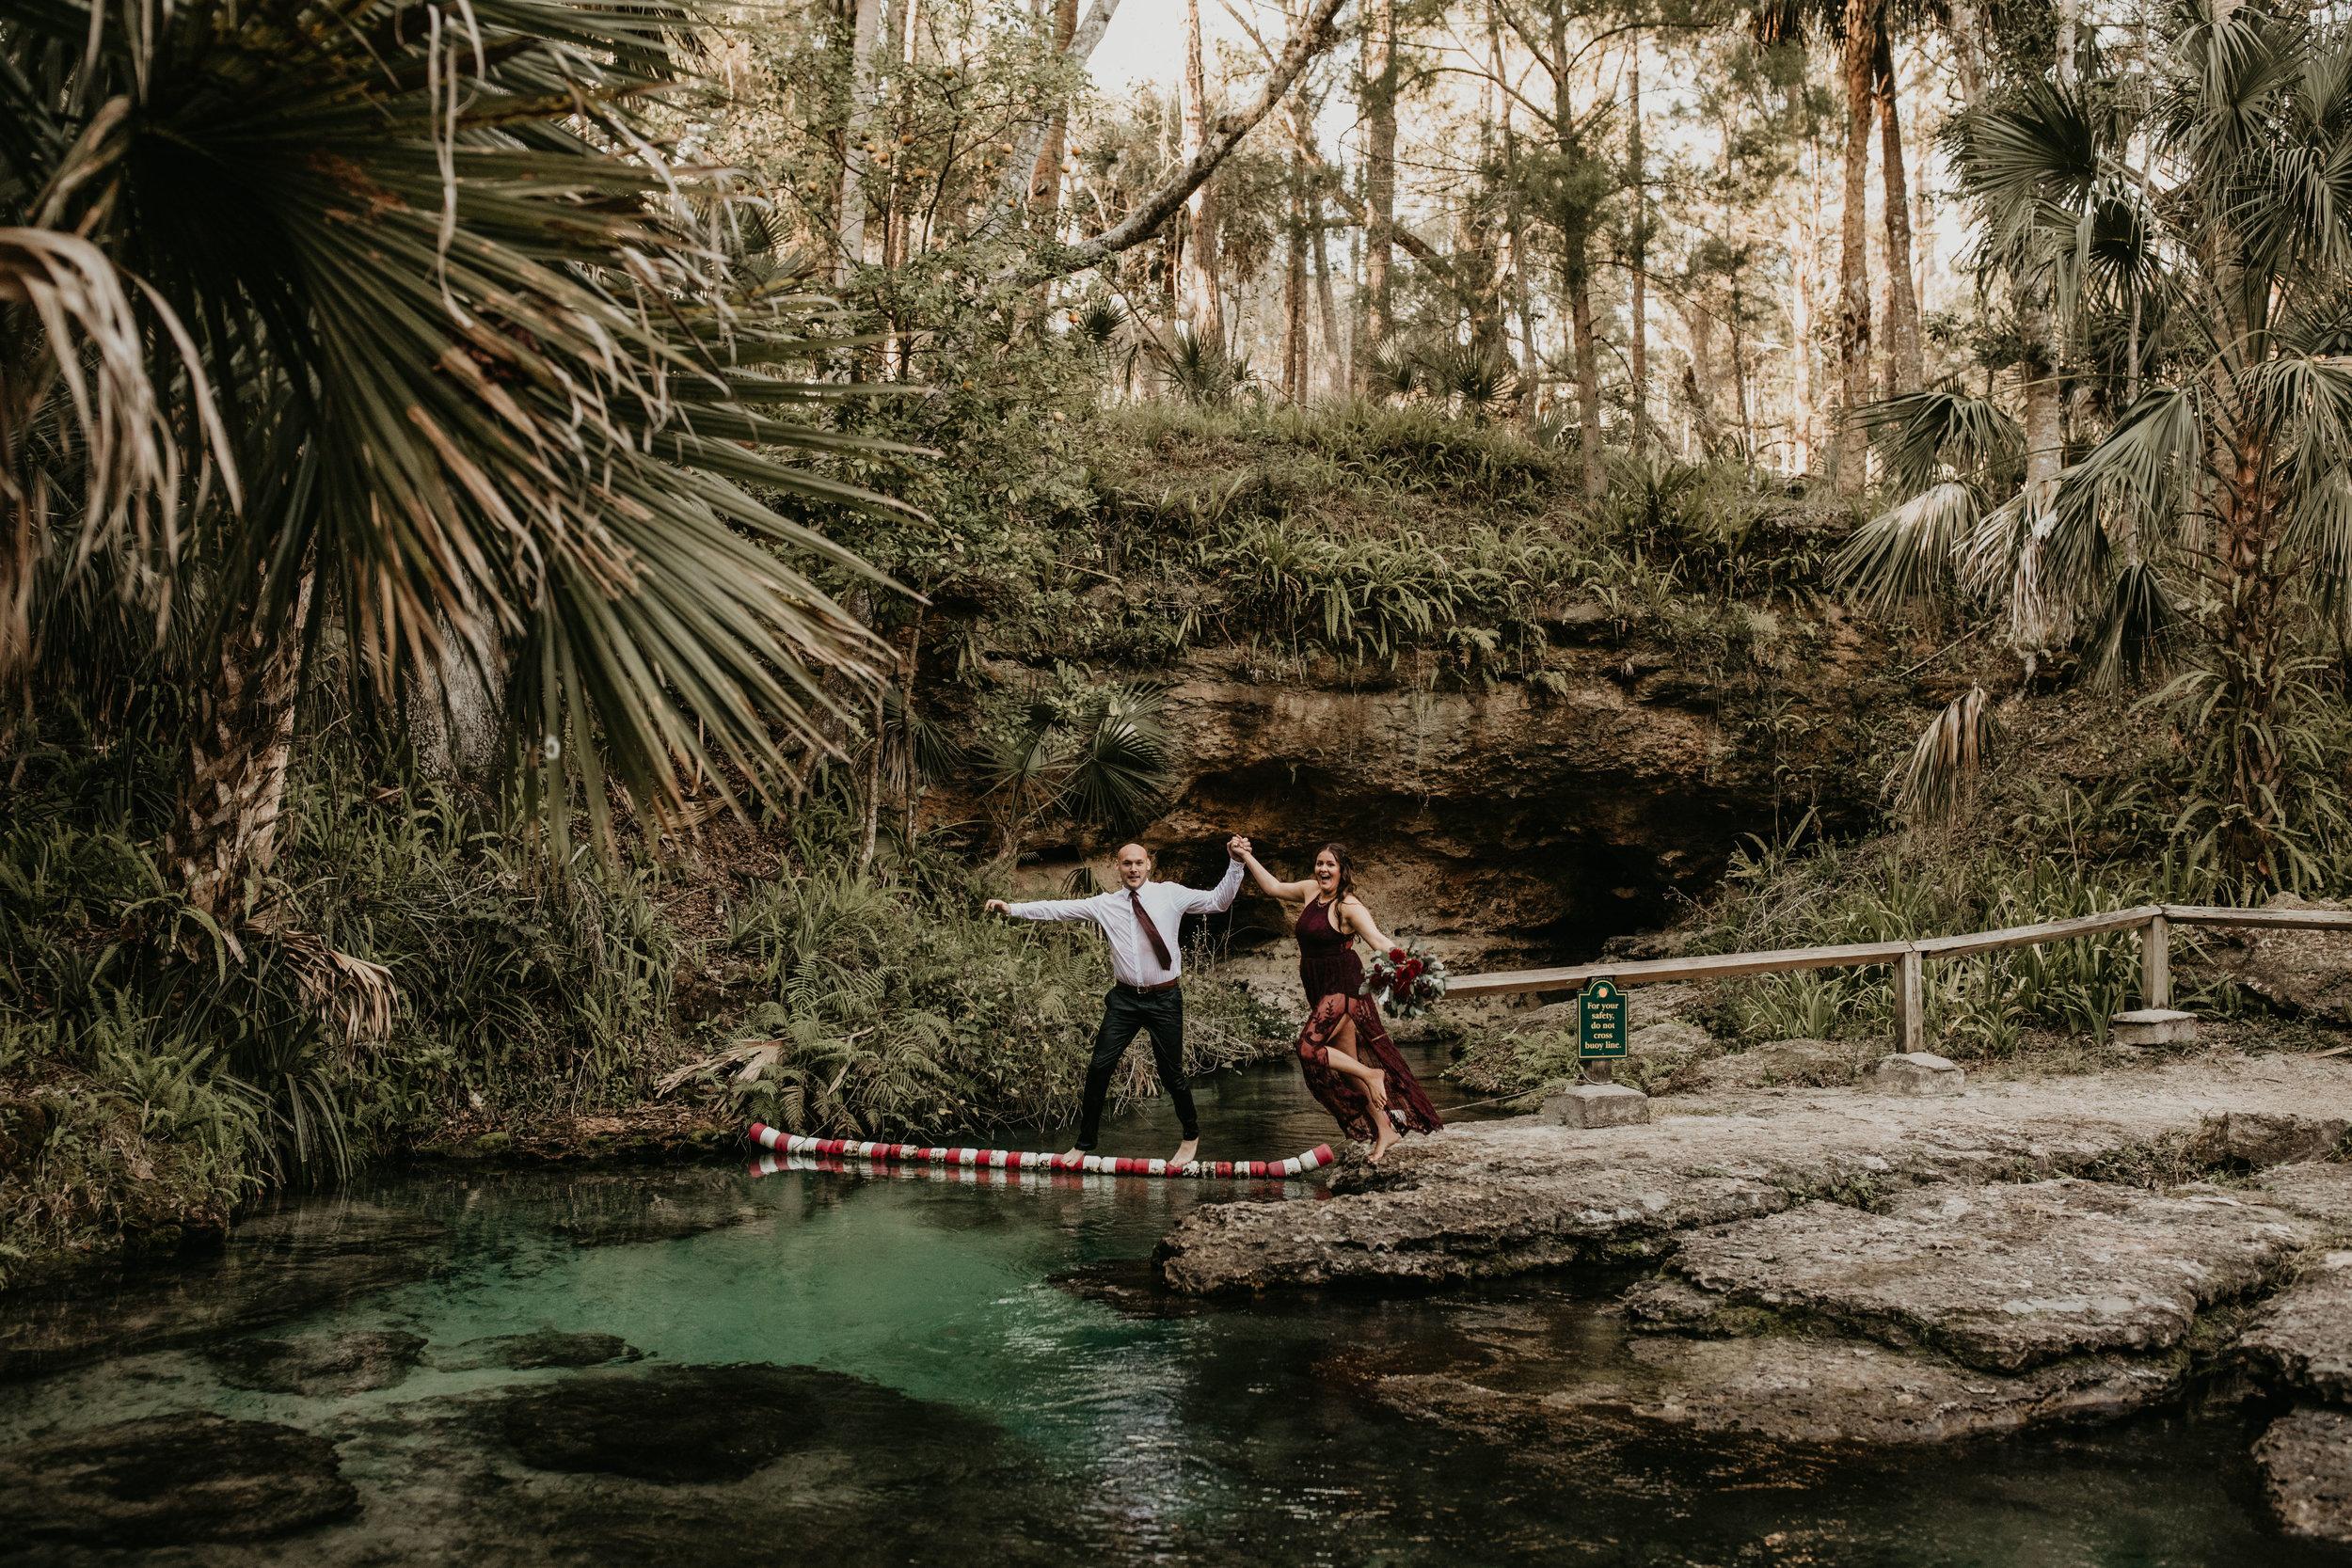 Kelly Park Rock Springs Florida-Engagement Session-Melissa and Daniel151.jpg